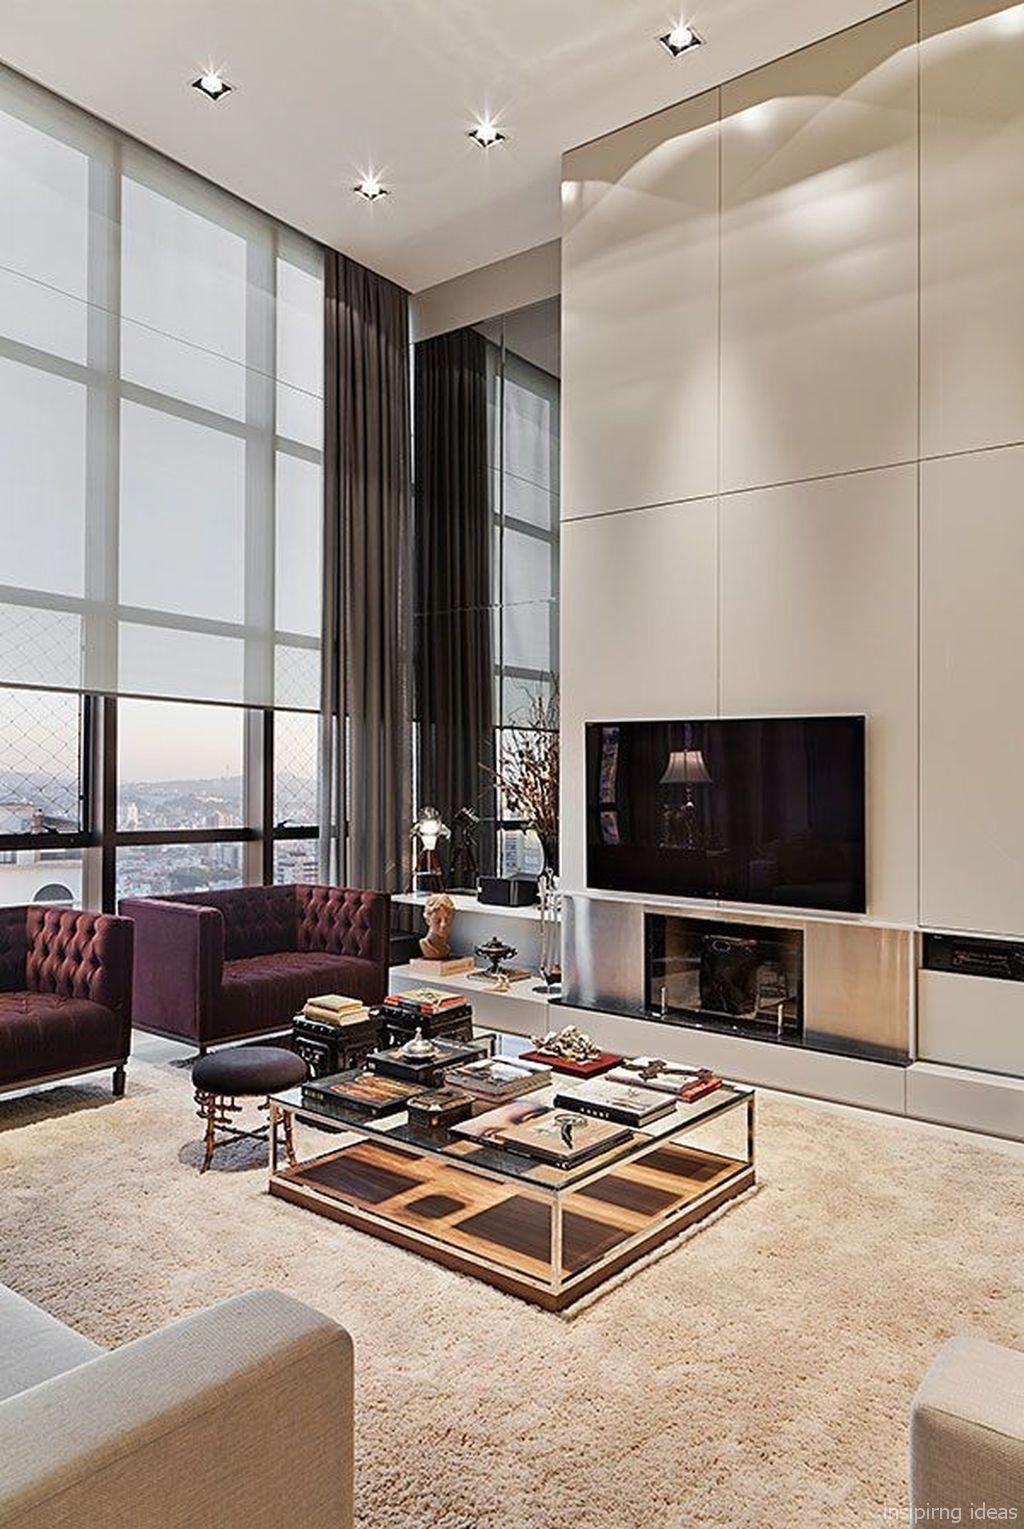 Small Modern Apartment Living Room Ideas: Luxury Modern Apartment Living Room Decorating Ideas On A